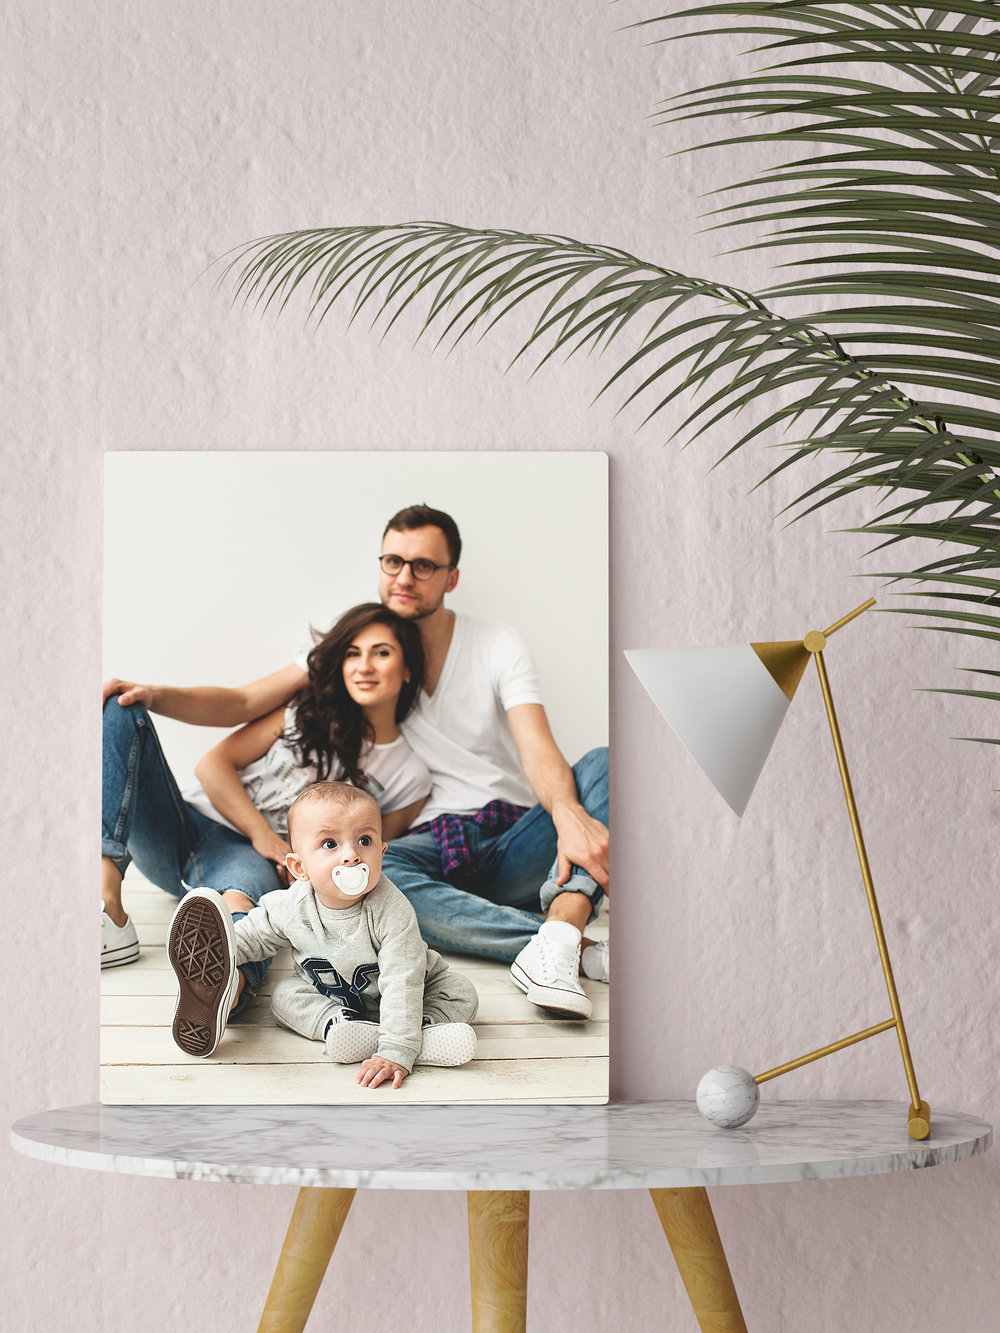 Canvas-Home-decor-5.jpg